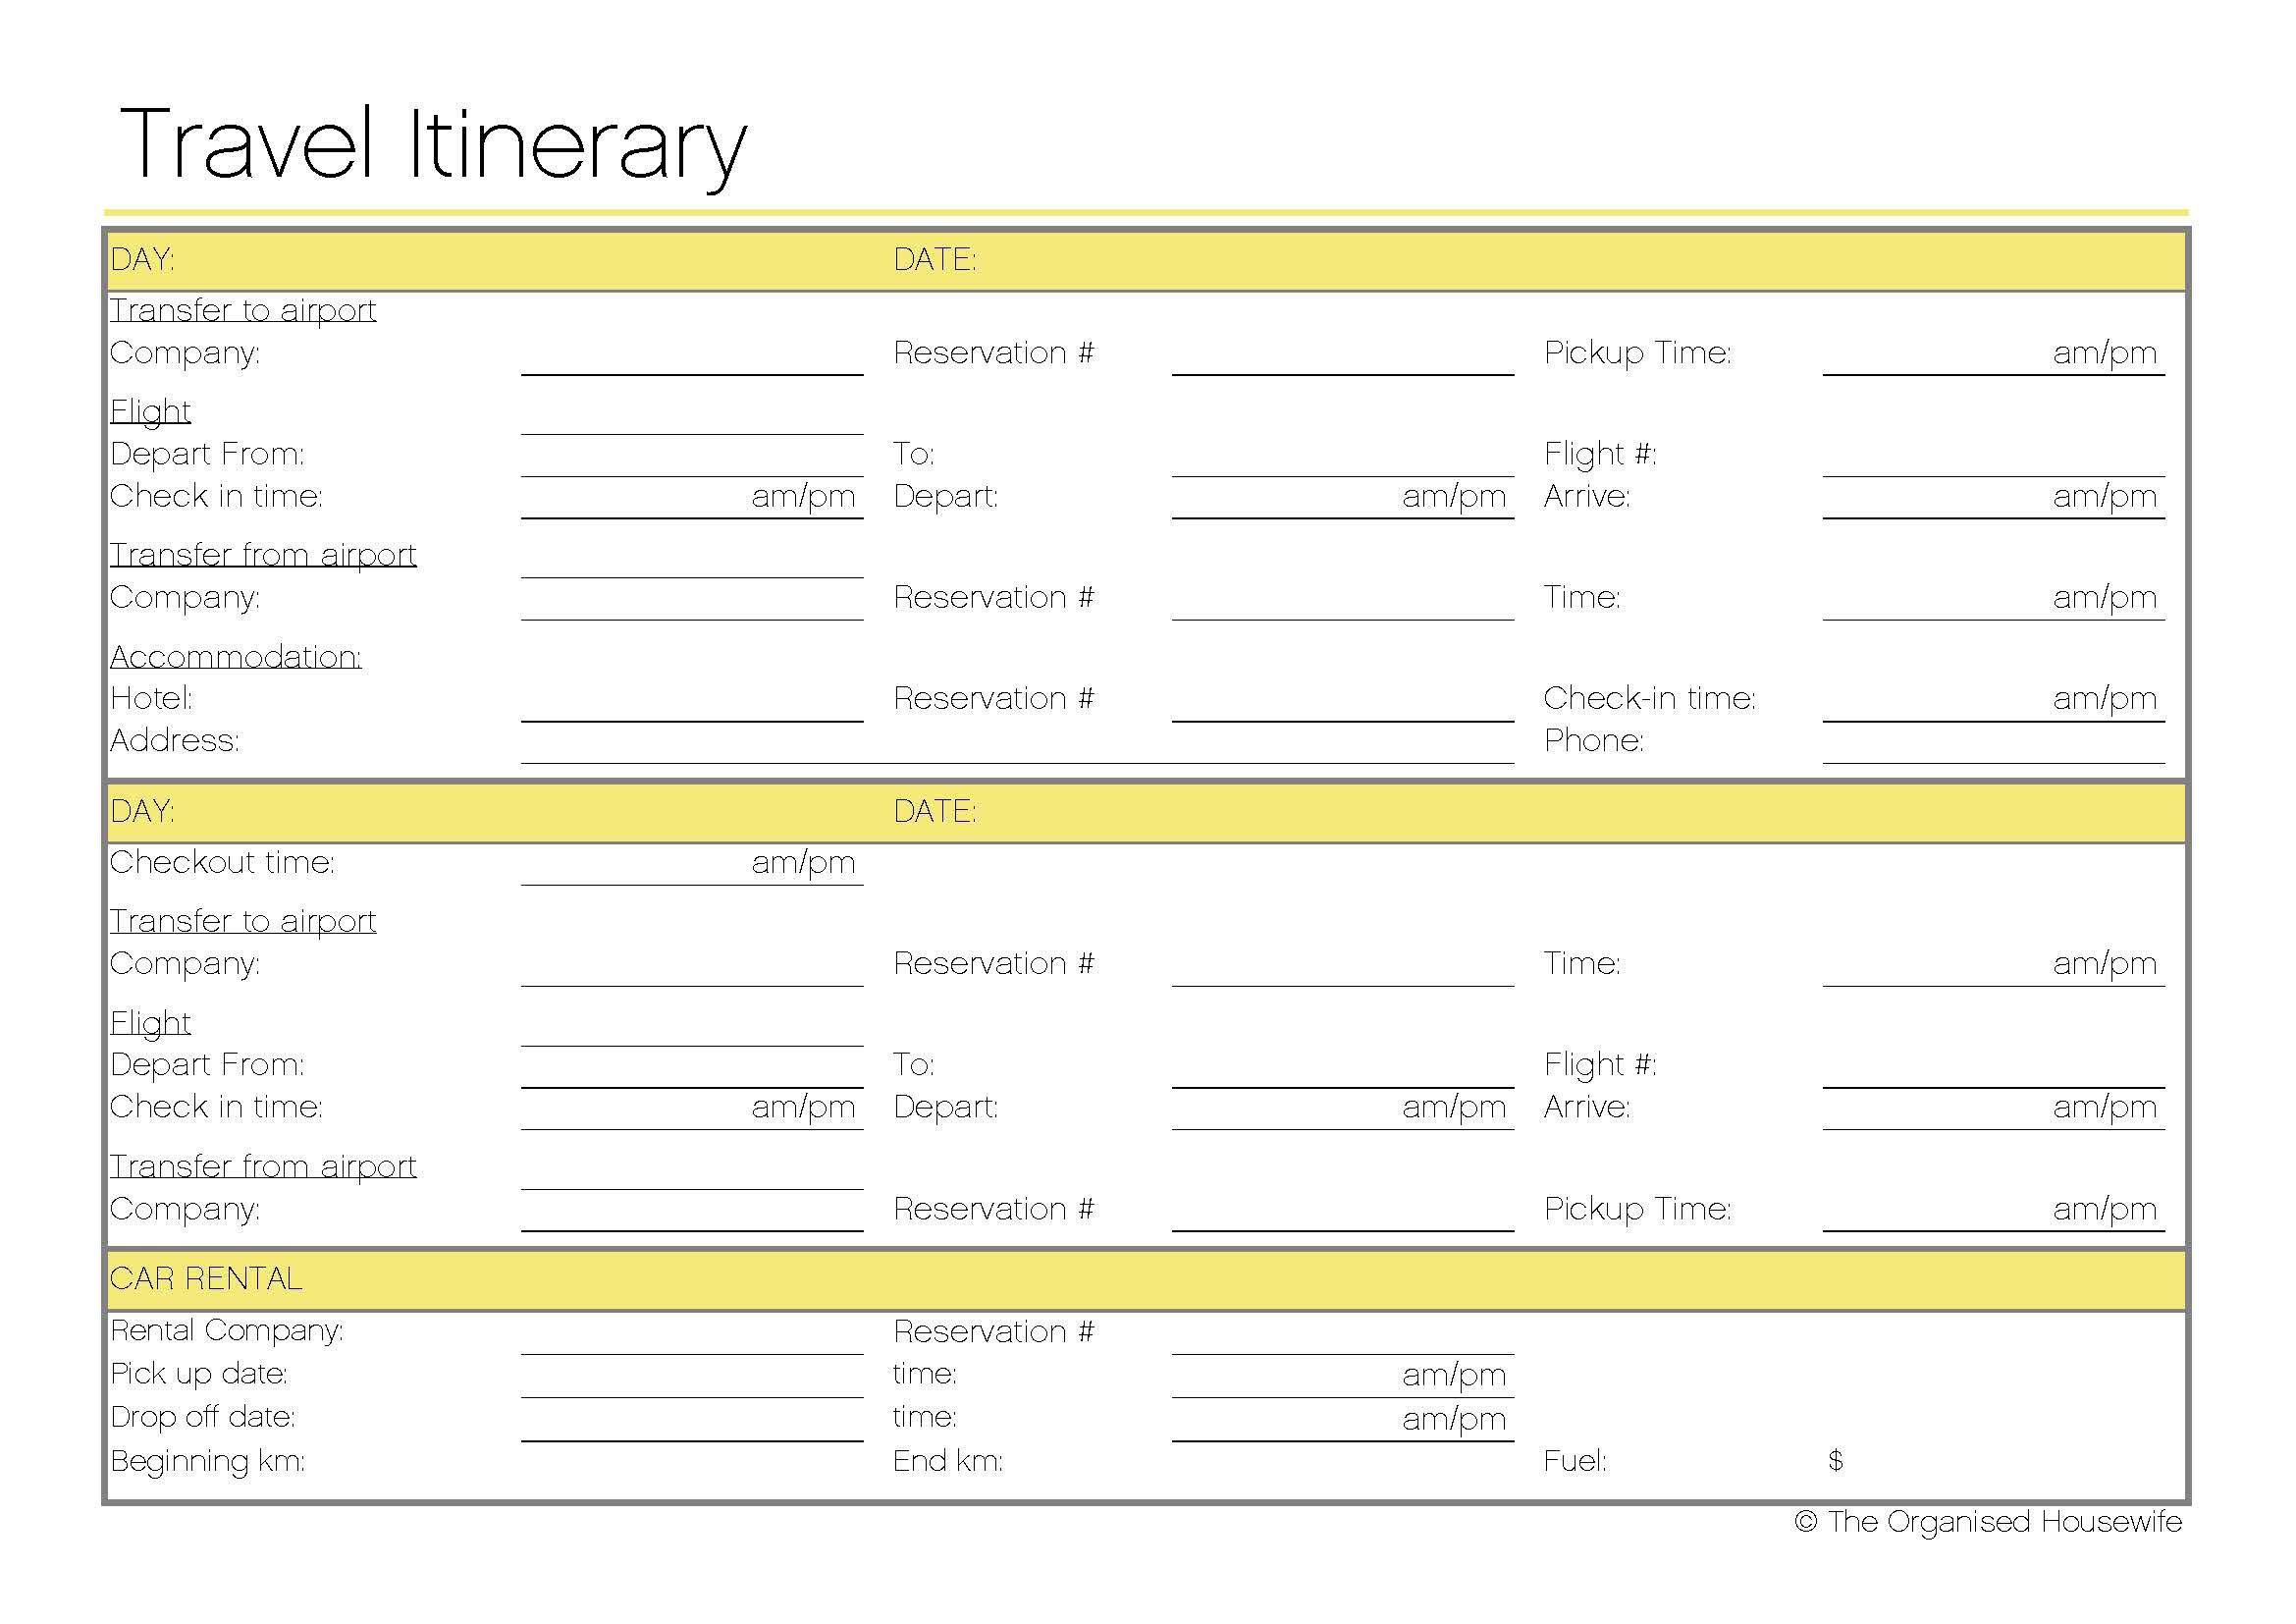 Travel Itinerary Travel itinerary template, Travel